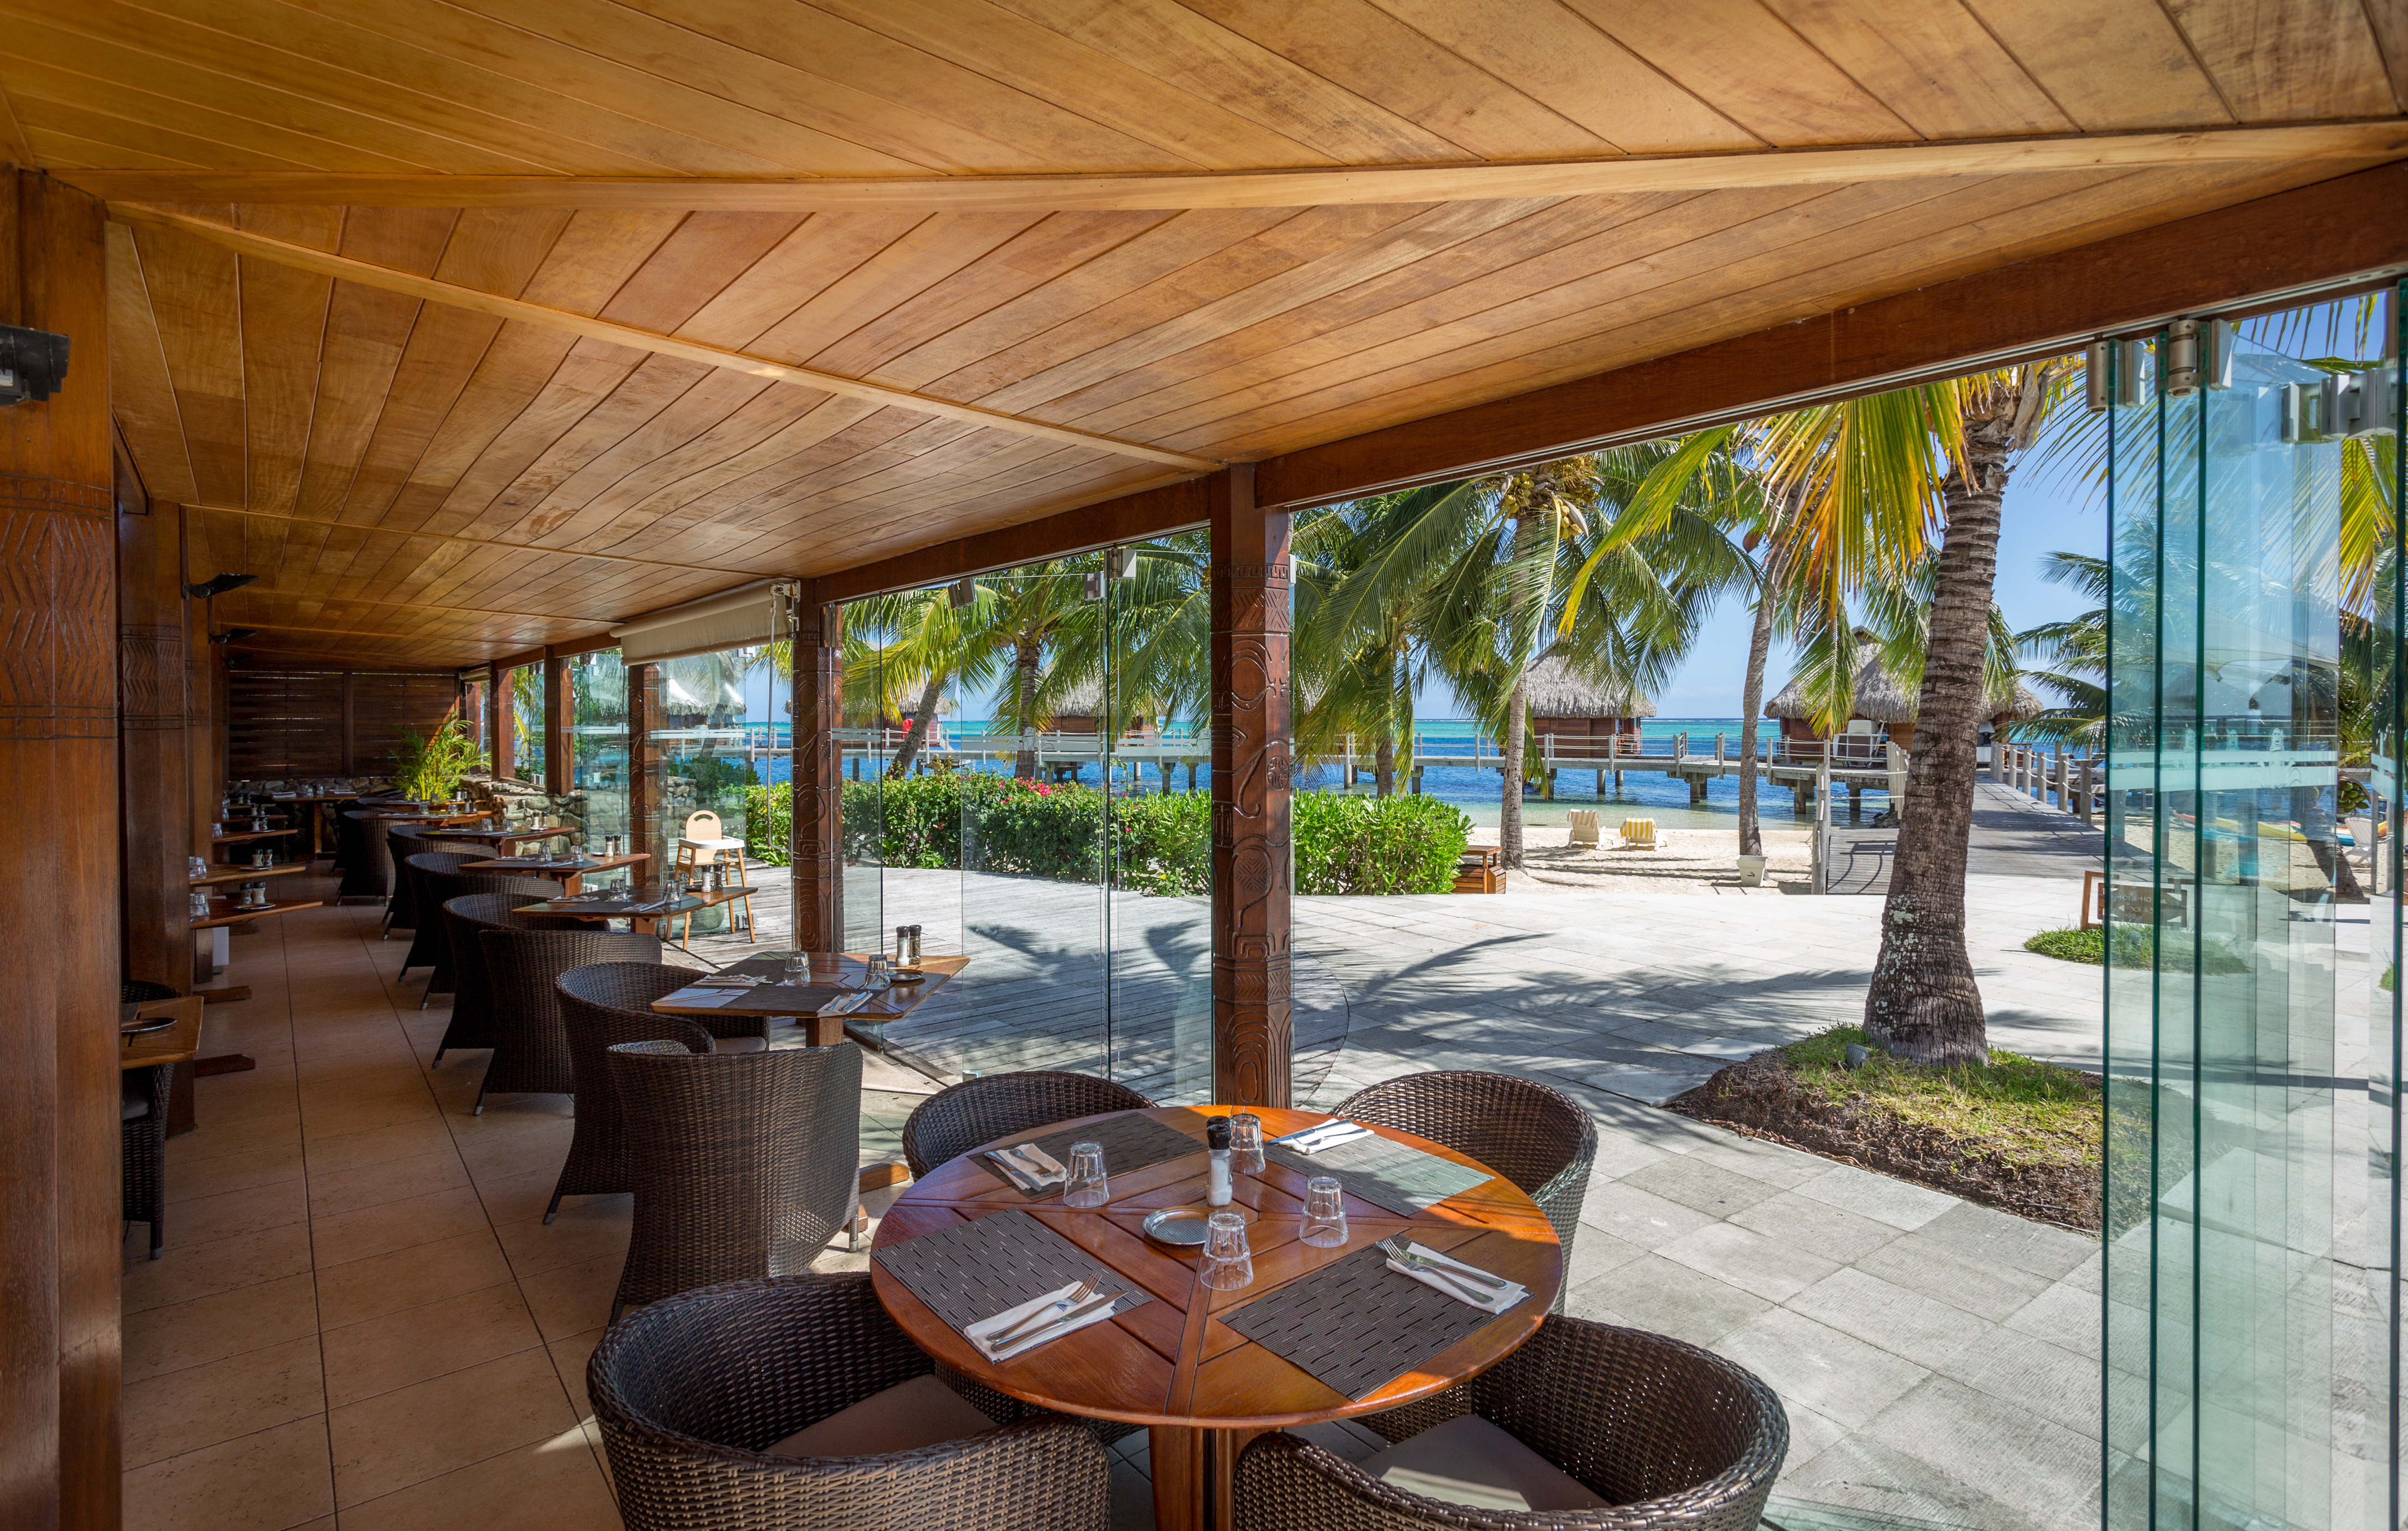 https://tahititourisme.com.au/wp-content/uploads/2018/03/RESTAURATION-Restaurant-Mahanai-1-Charles_Veronese.jpg